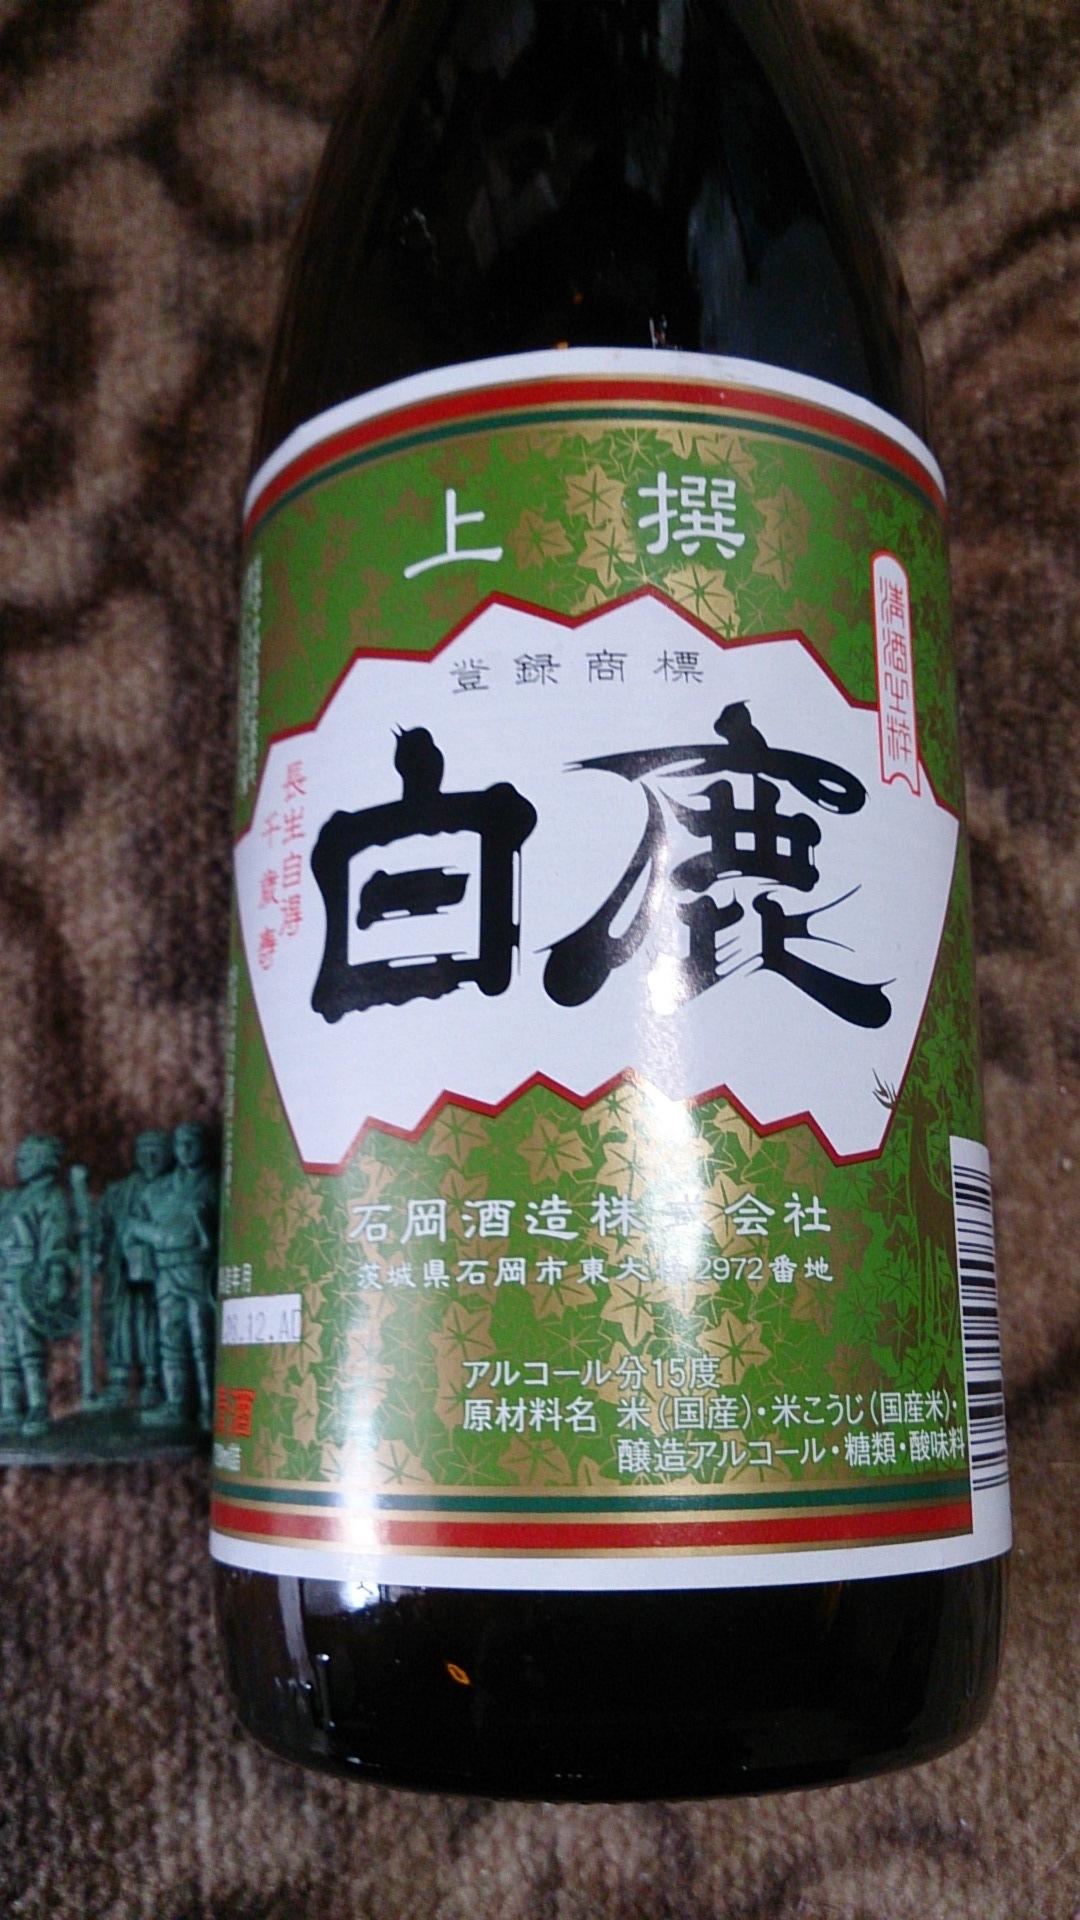 石岡酒造 name=